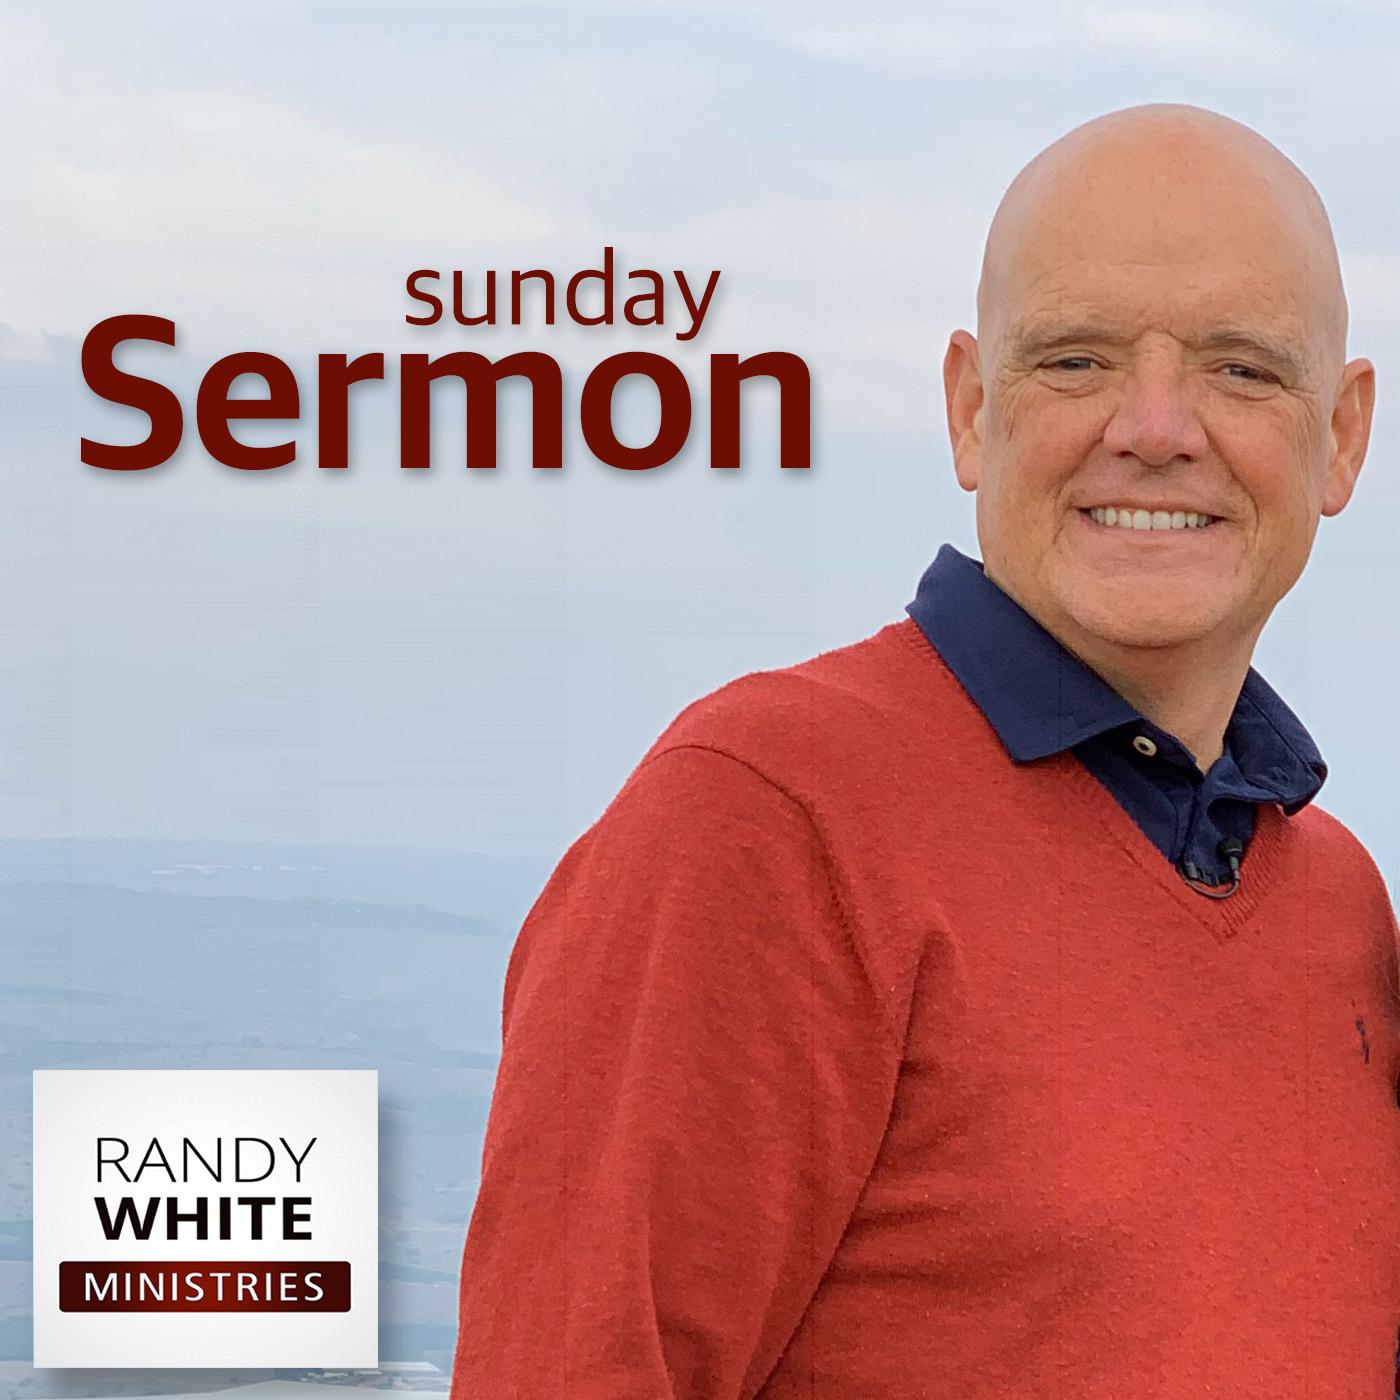 RWM: Sunday Sermon